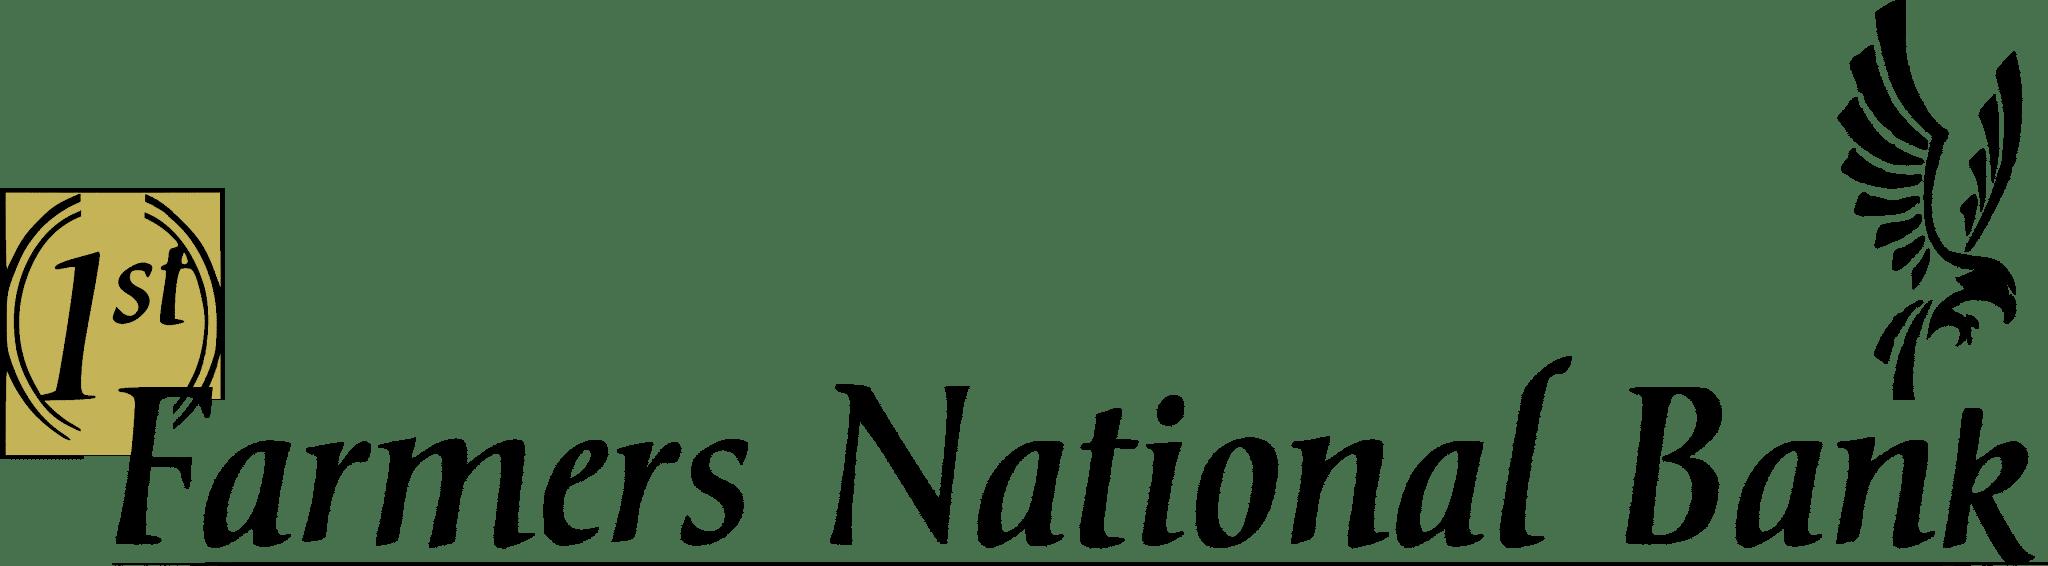 First Farmers National Bank Logo